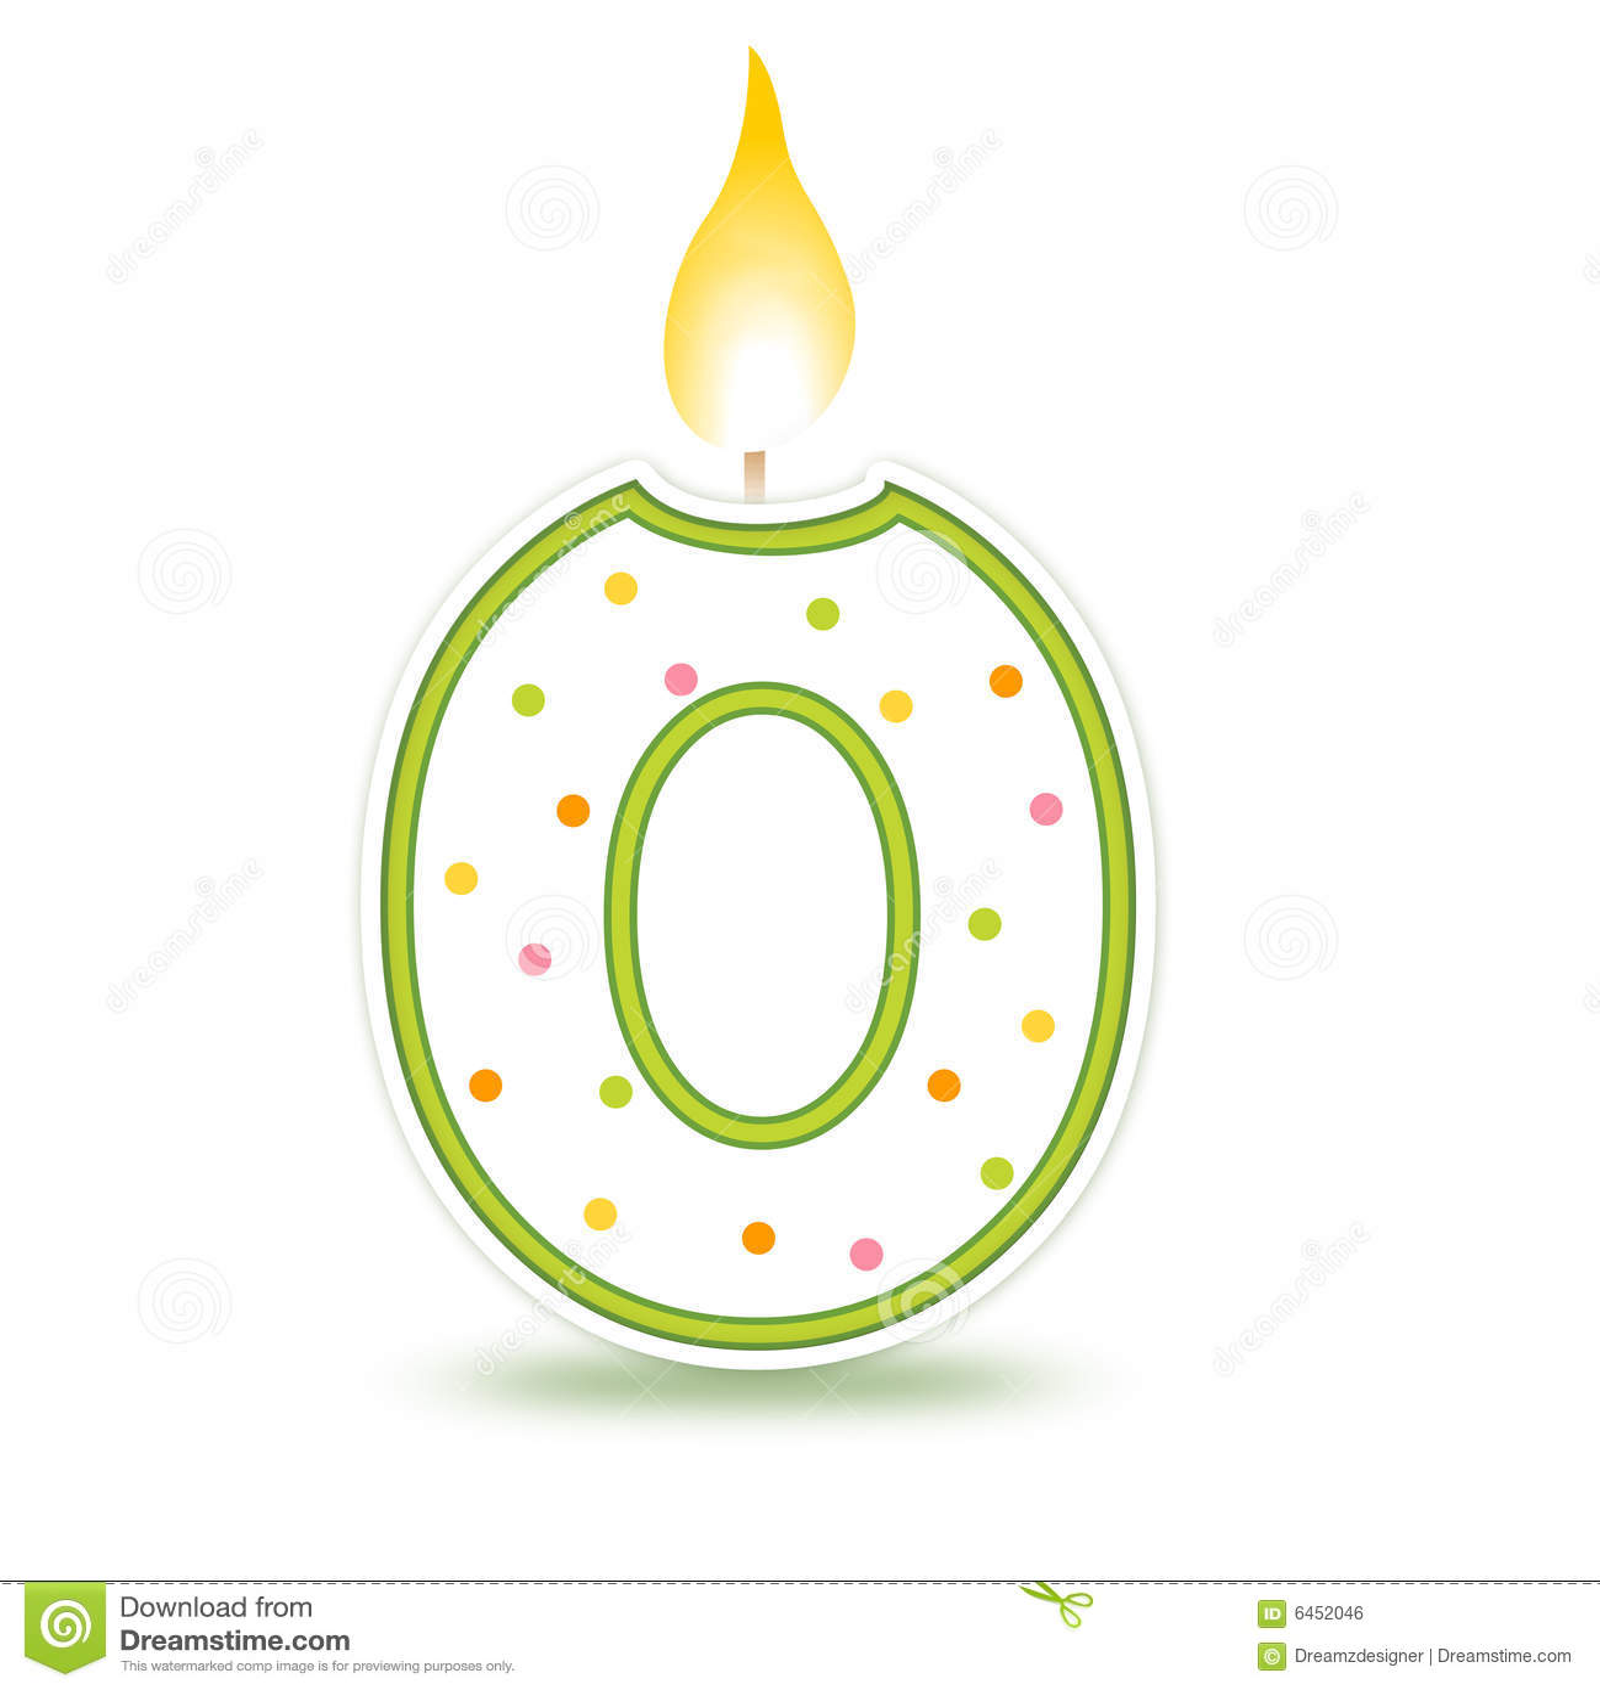 0 födelsedagstearinljus